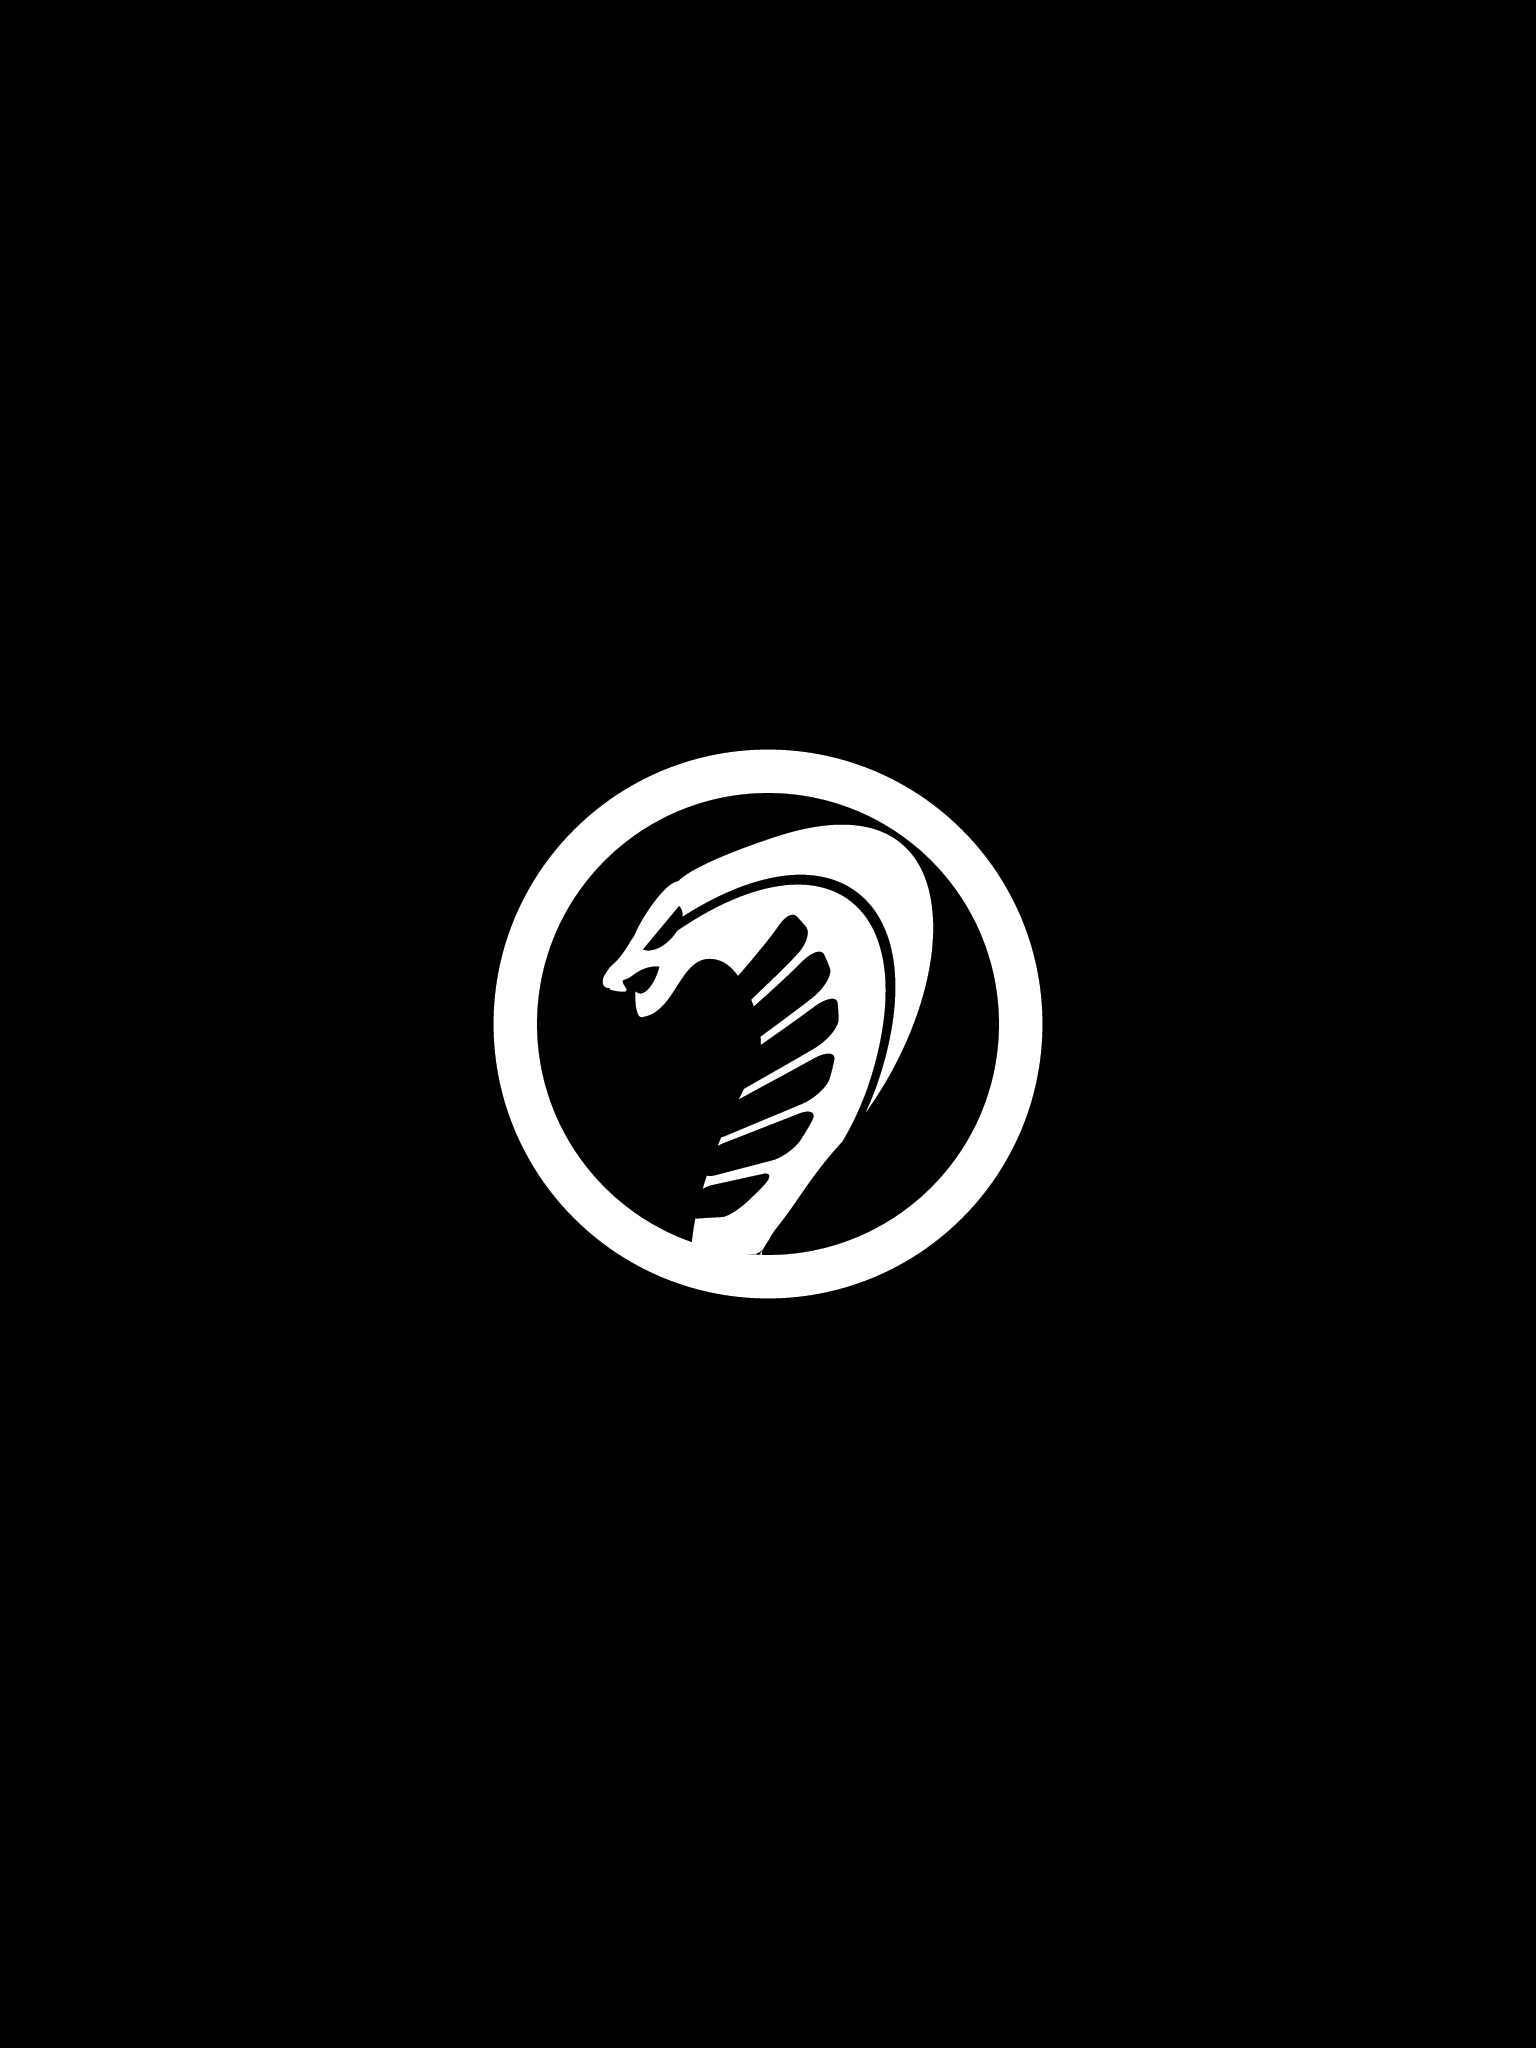 Download venom mobile wallpapers venom computers download voltagebd Image collections